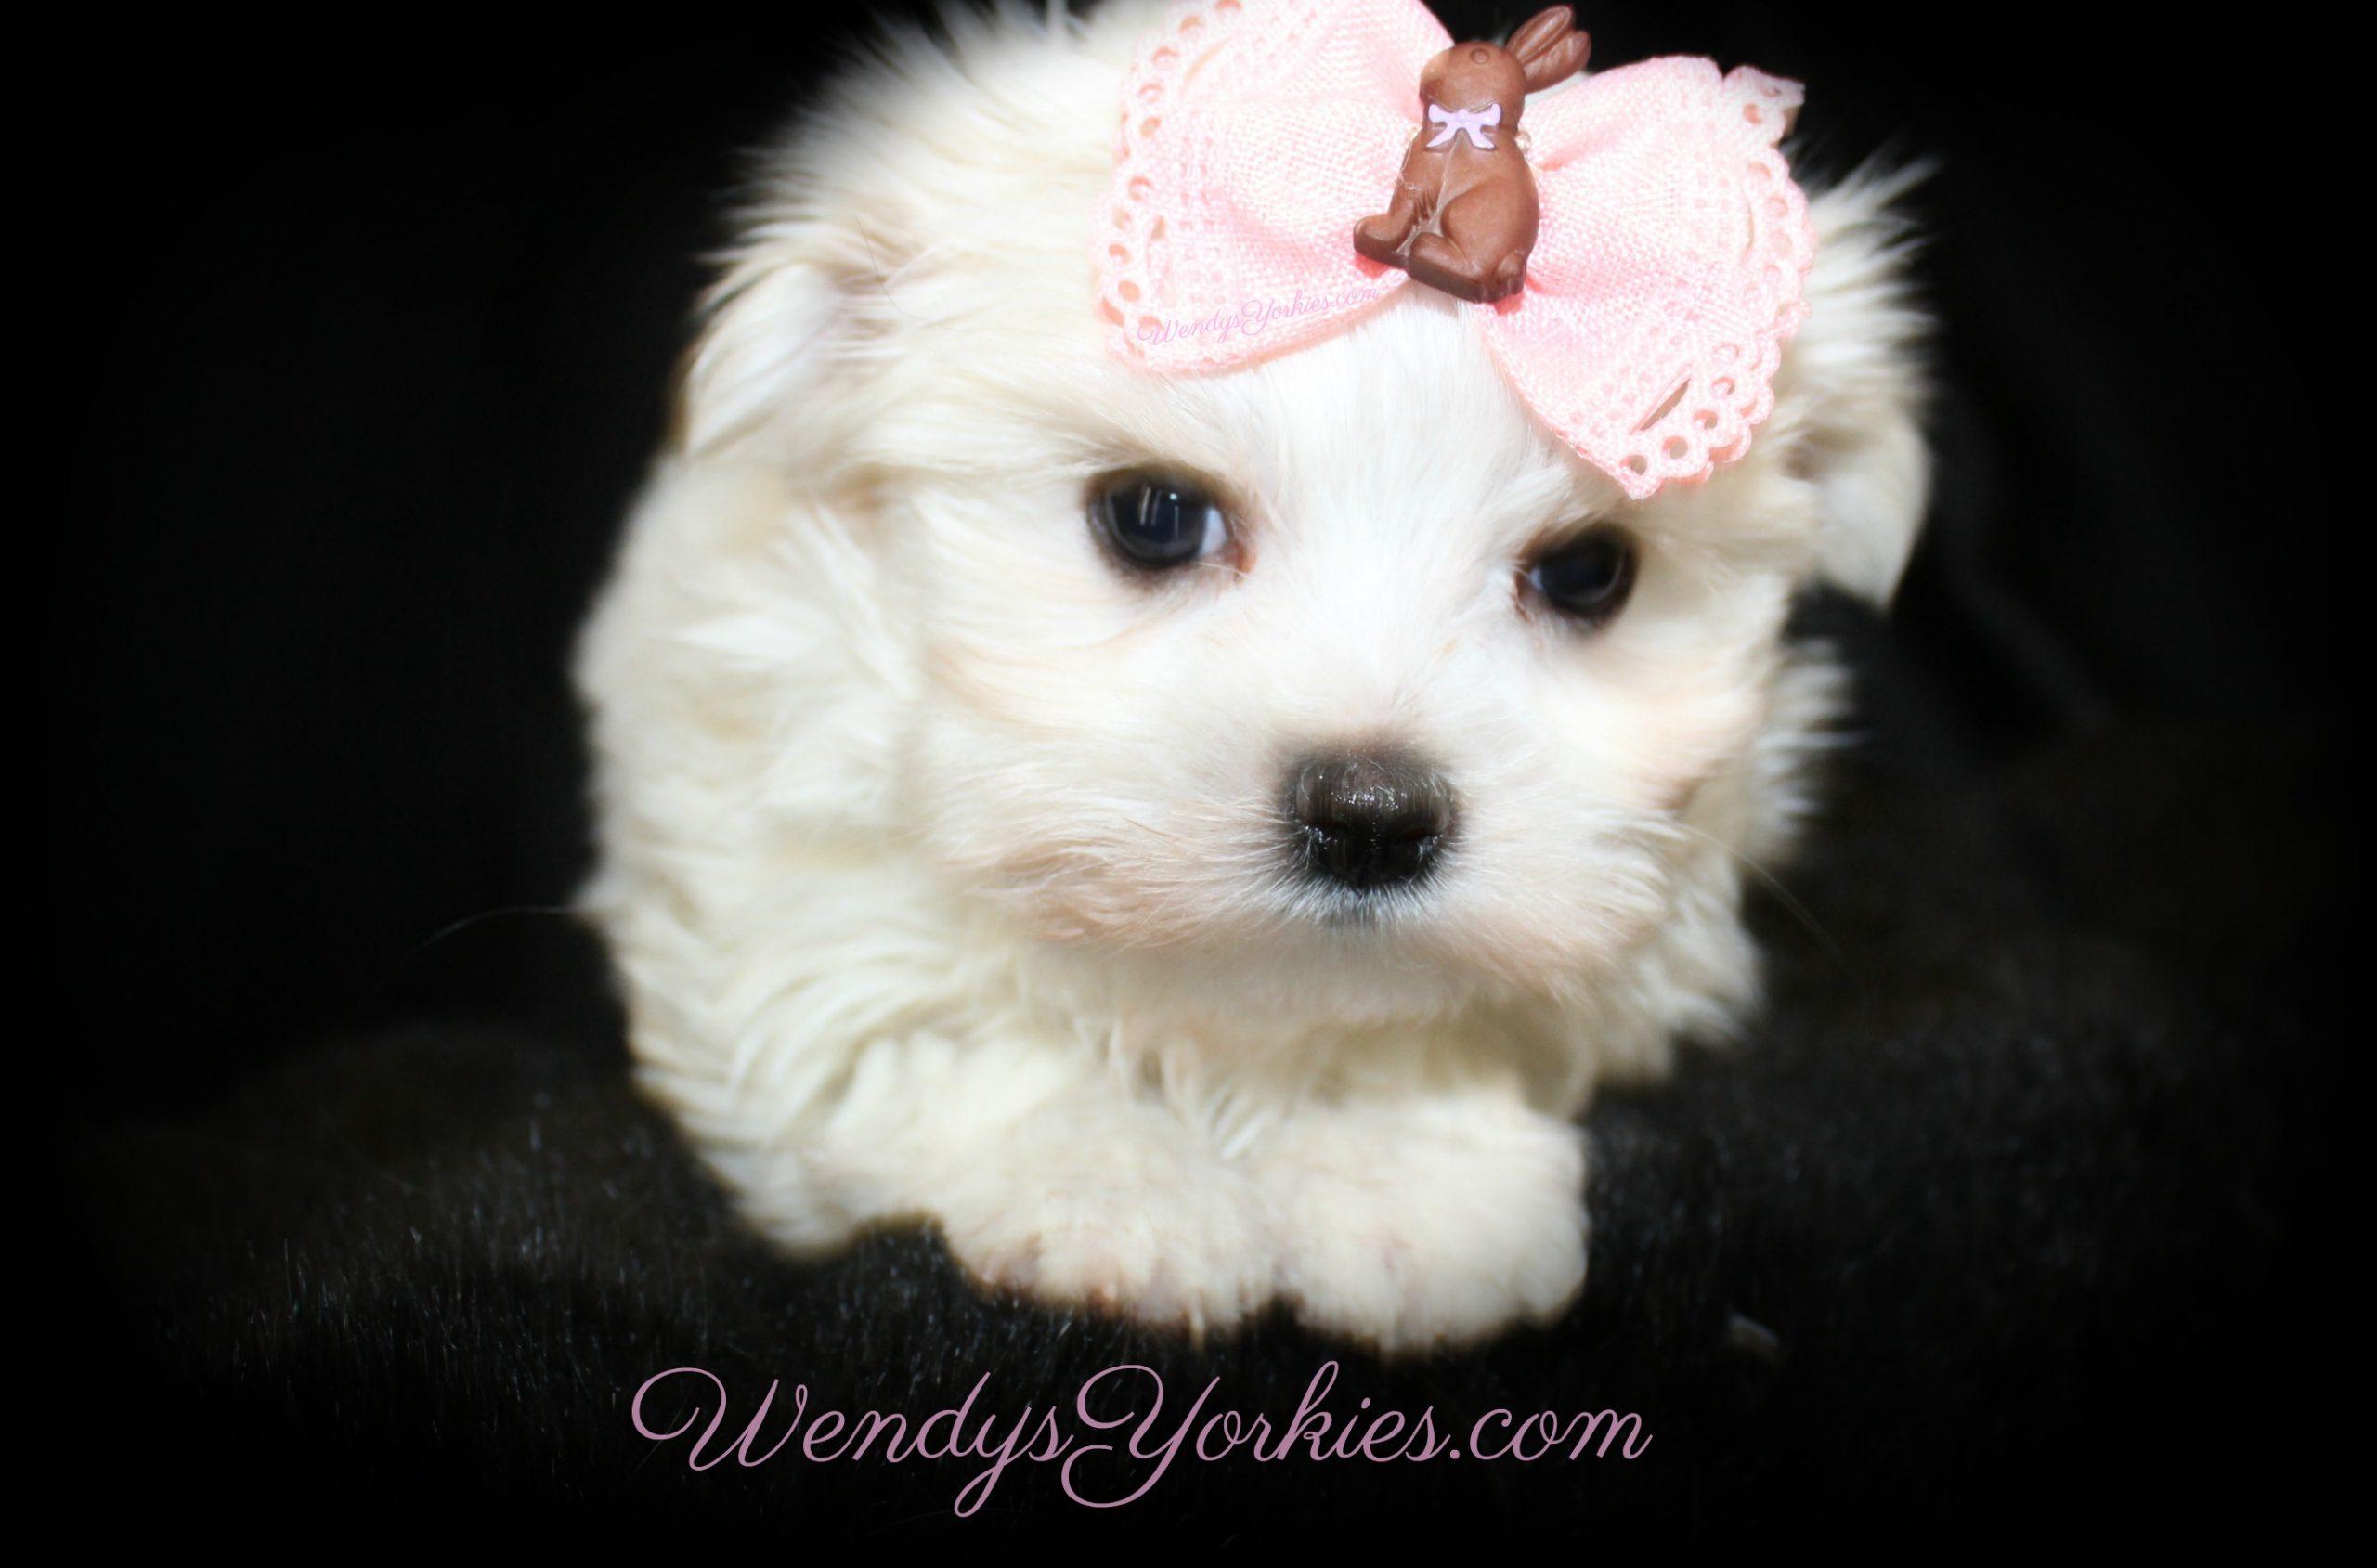 Cutest Maltese puppy for sale, Ellie, Female Maltese puppy for sale in Texas, WendysYorkies.com